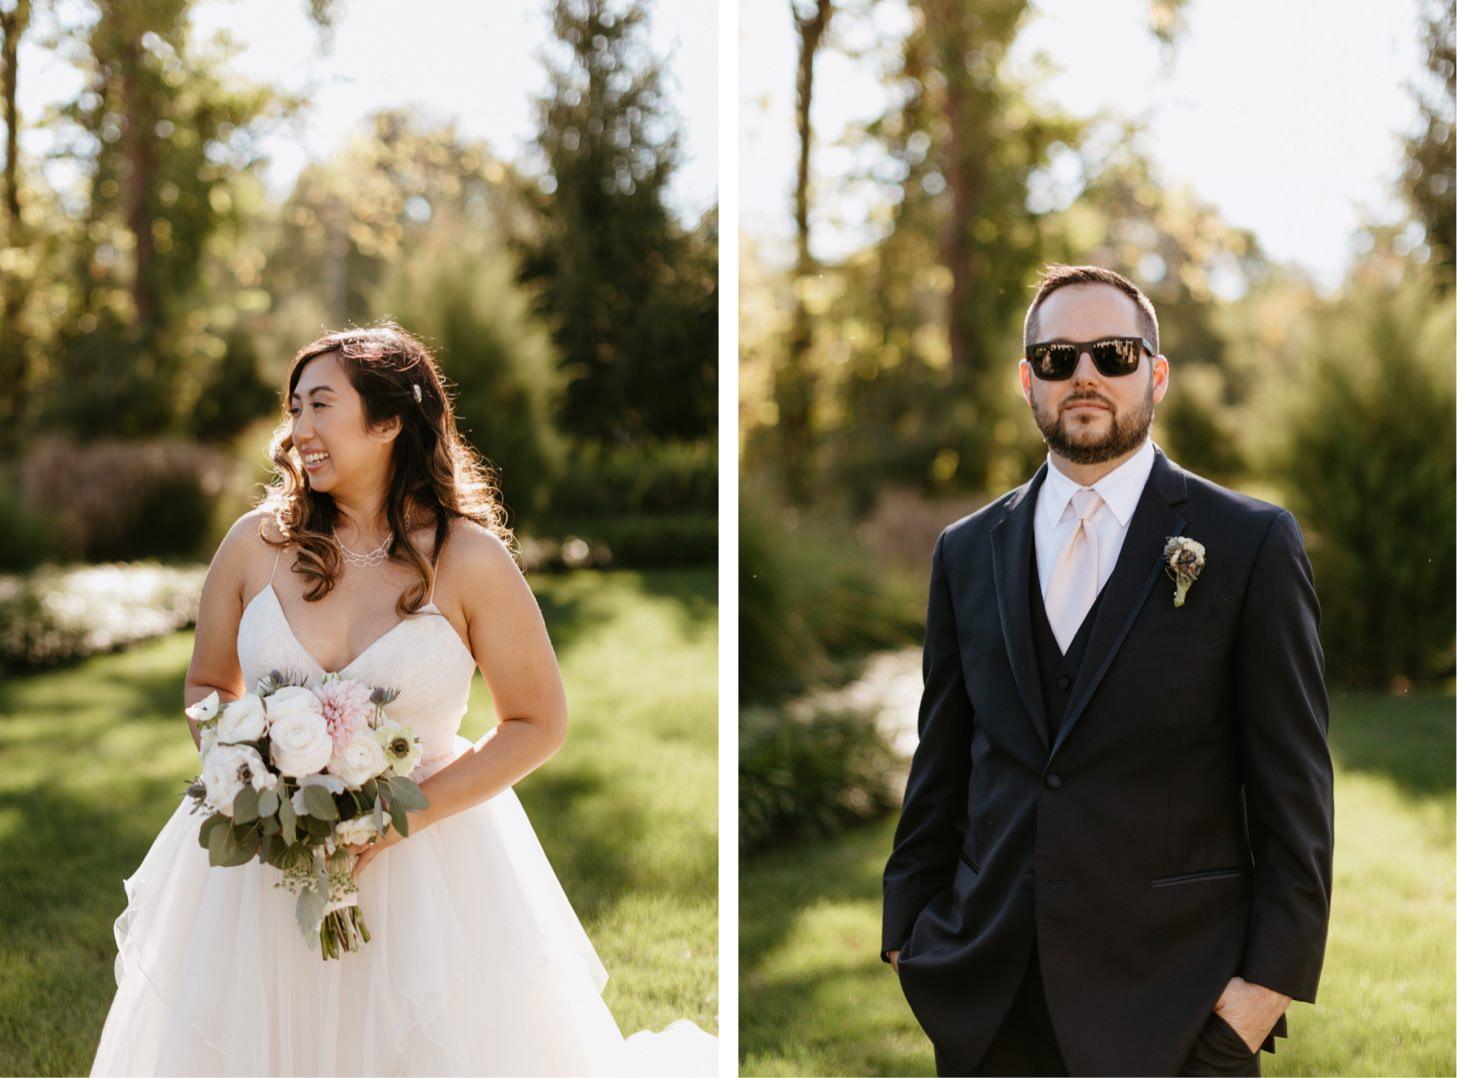 ritz-charles-wedding-reception-downtown-indianapolis-wedding-photographer010.JPG